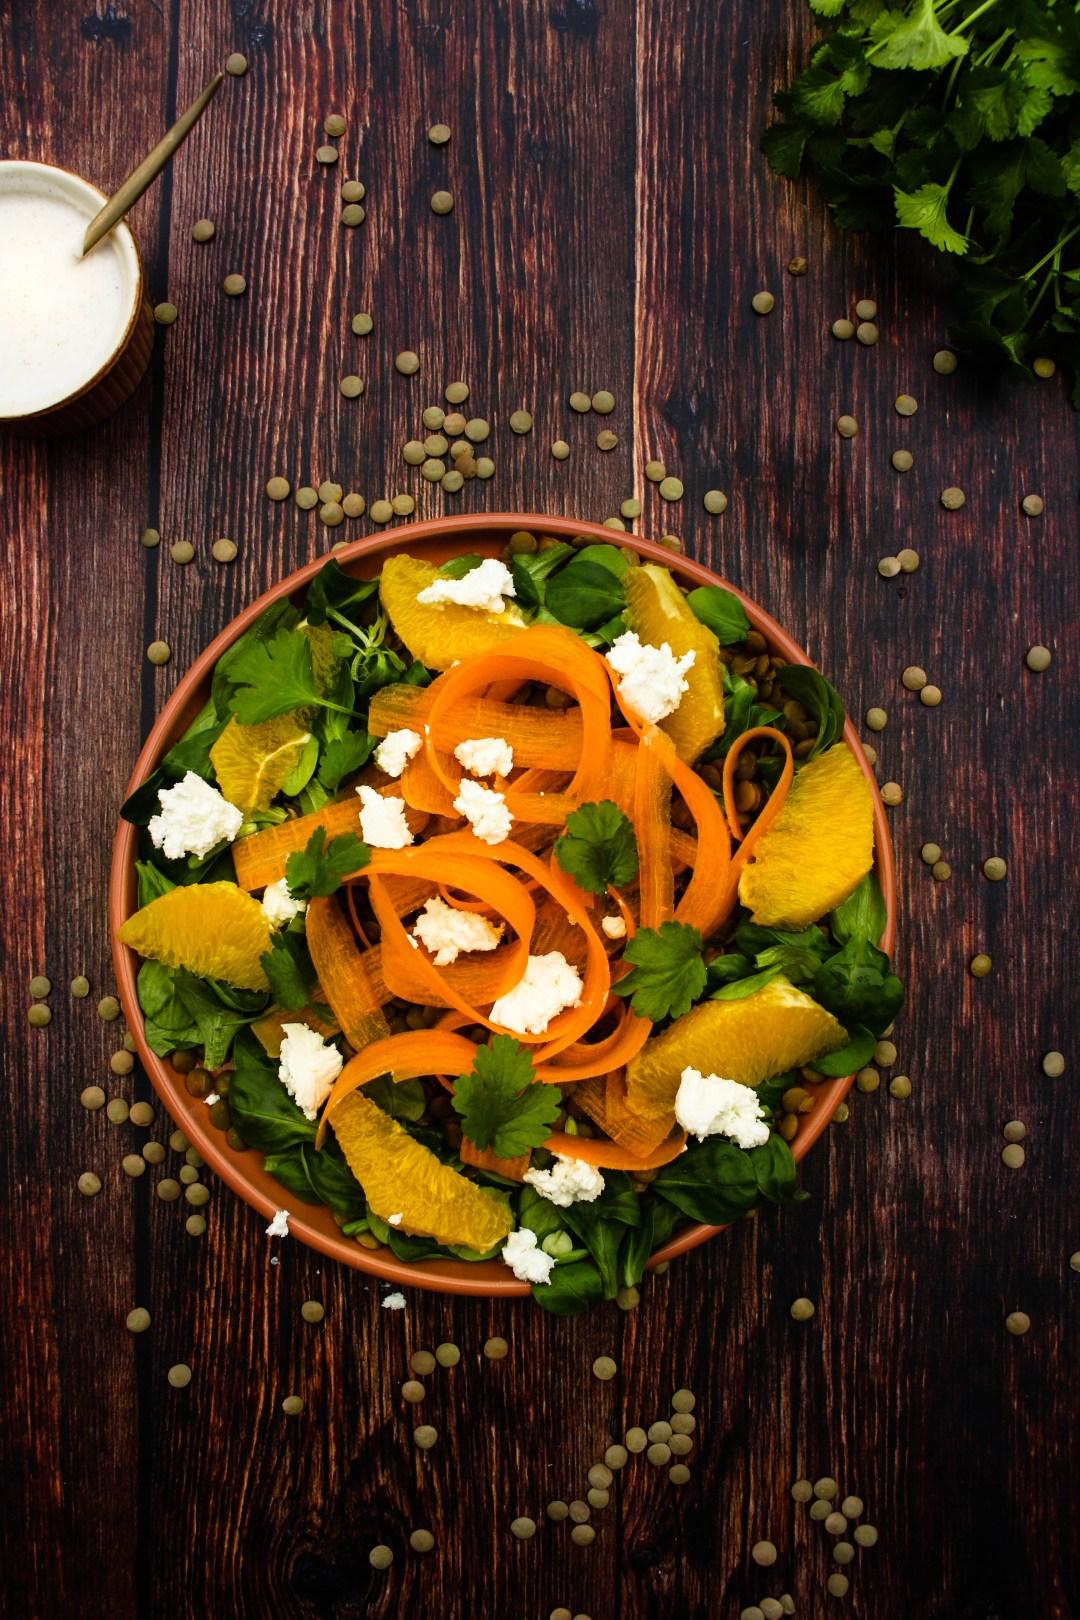 salade sinaasappel linzen wortel jozefien ryckx goestjes gezond glutenvrij